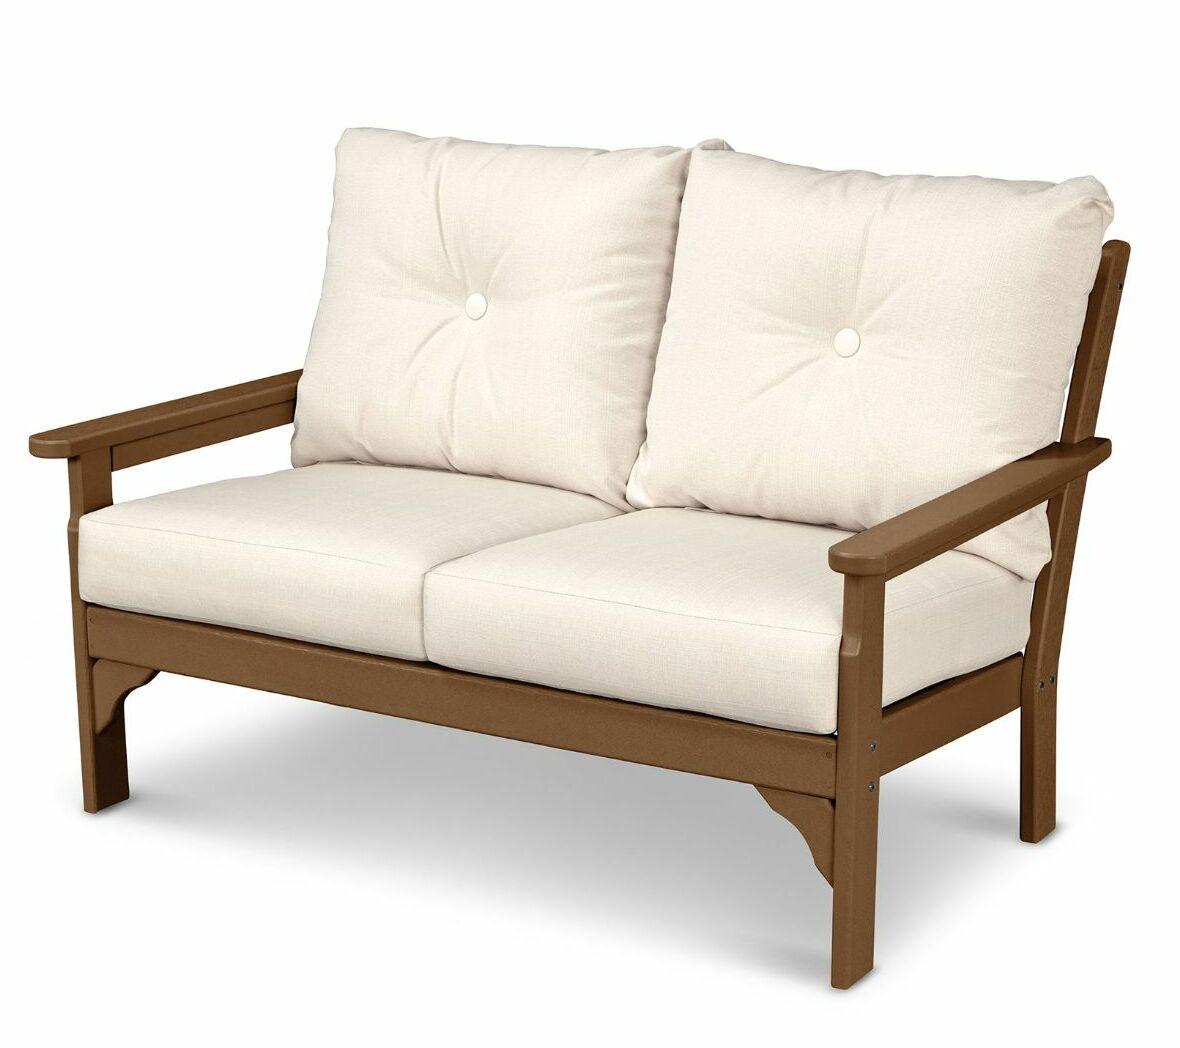 Vineyard Deep Seating Settee Loveseat with Cushions Finish: Mahogany, Fabric: Sesame